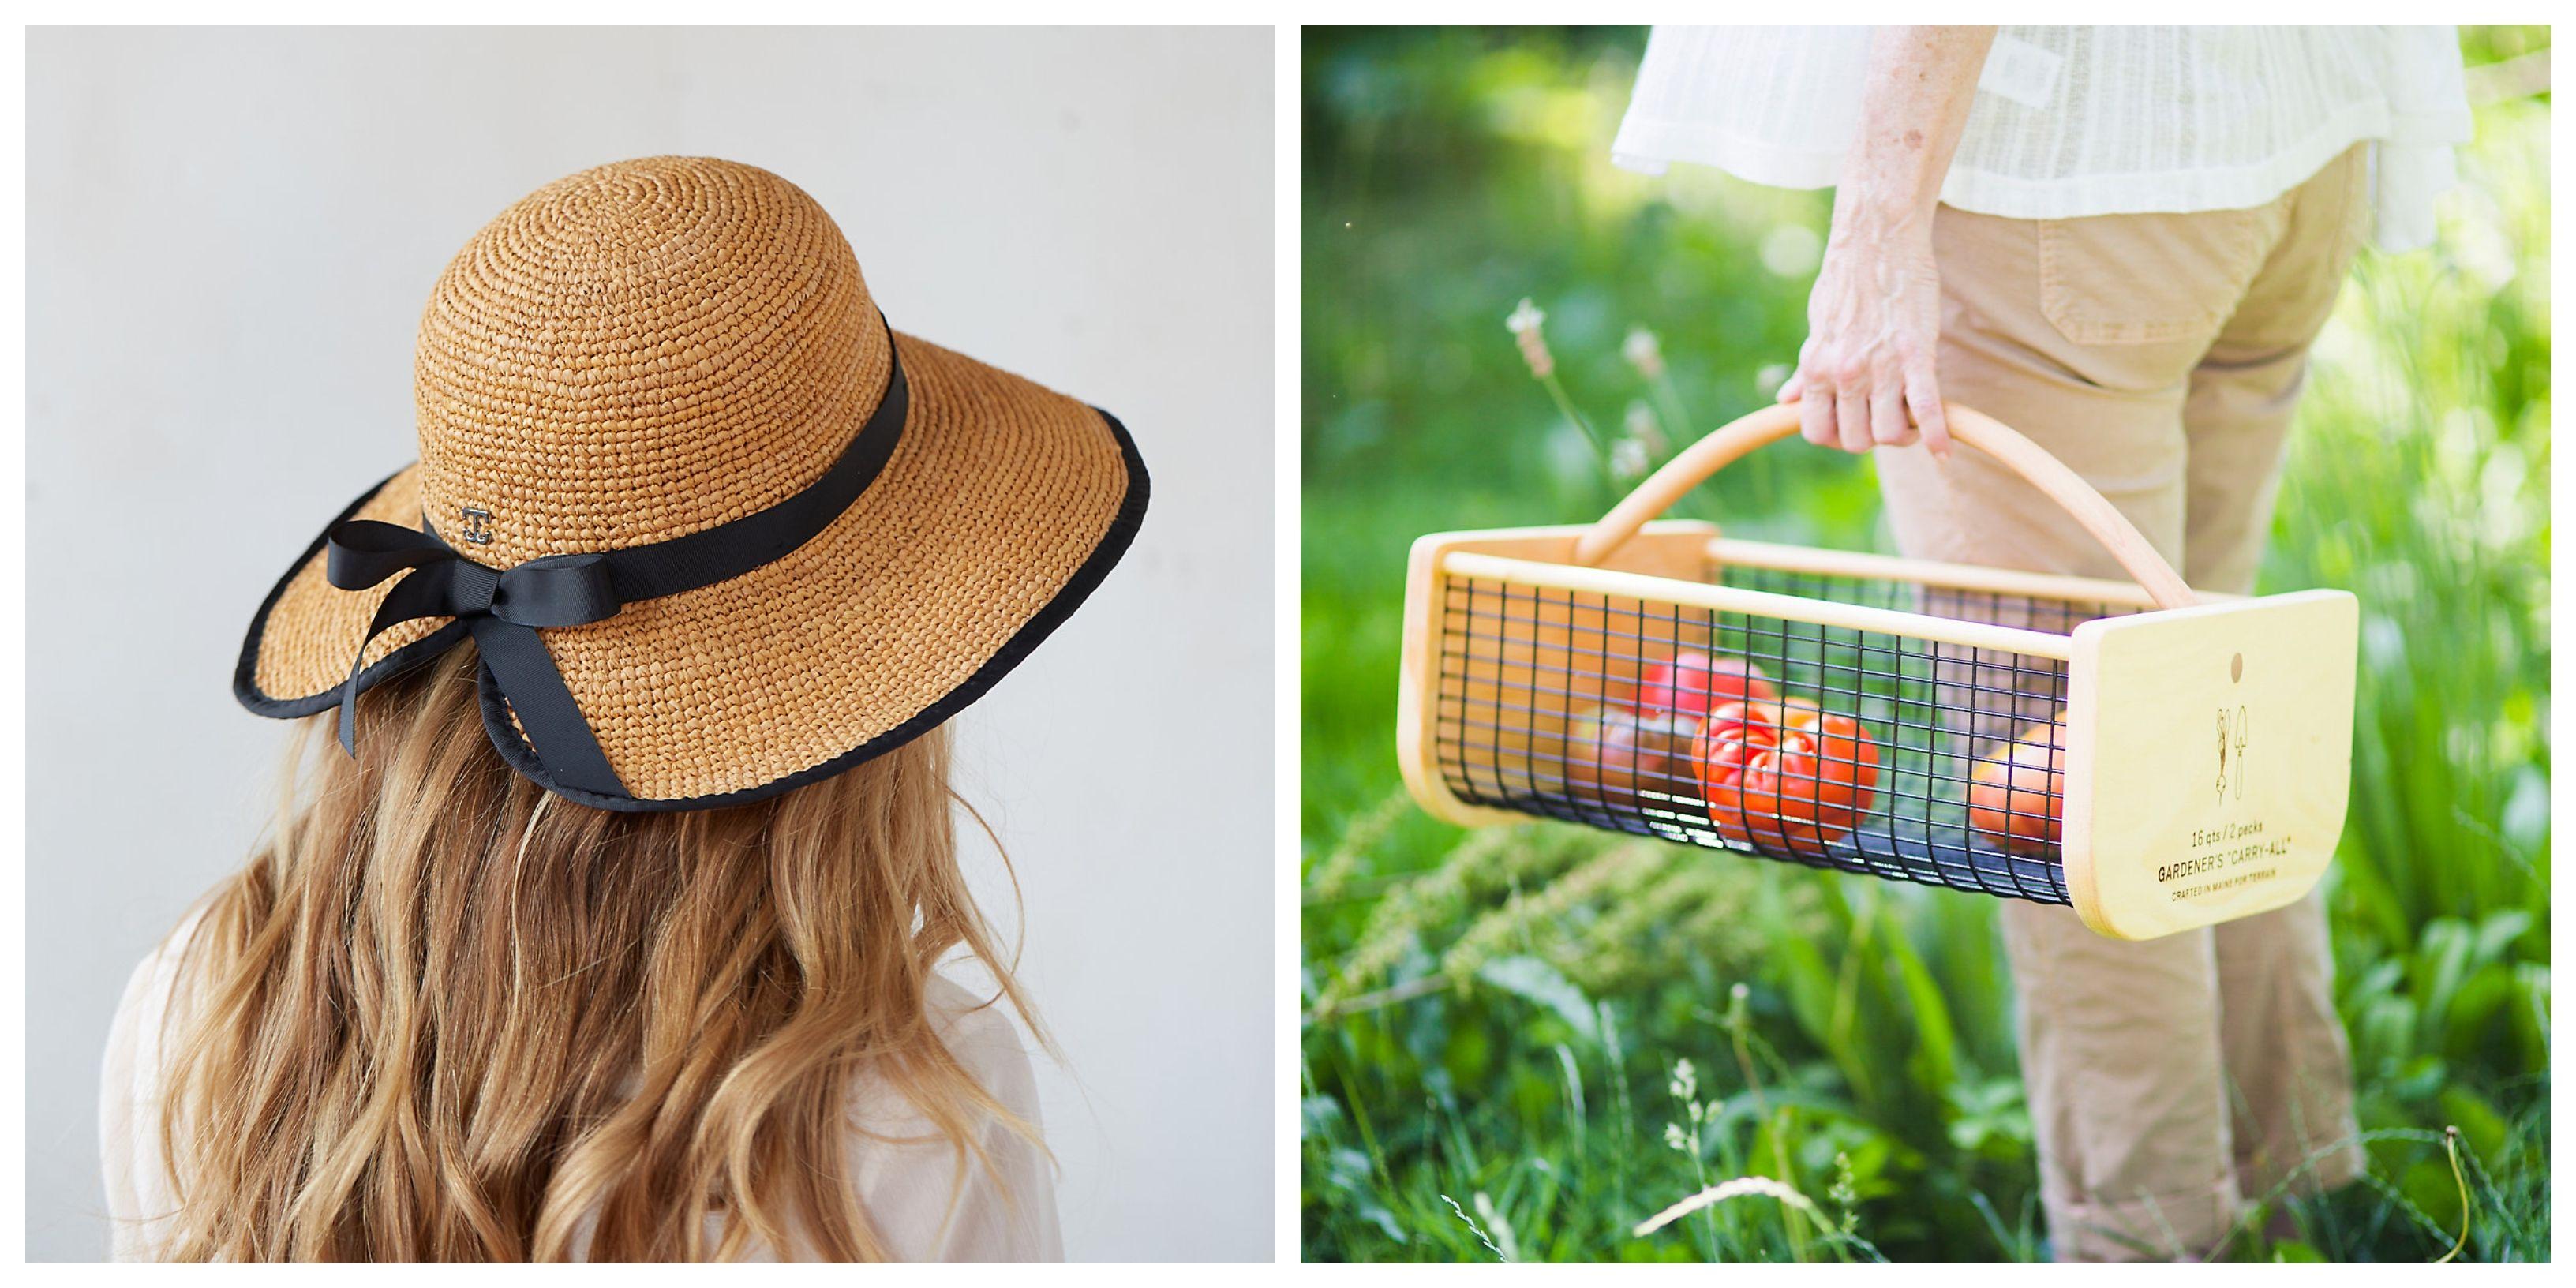 20 Best Gardening Gifts - Christmas Gift Ideas for Gardeners